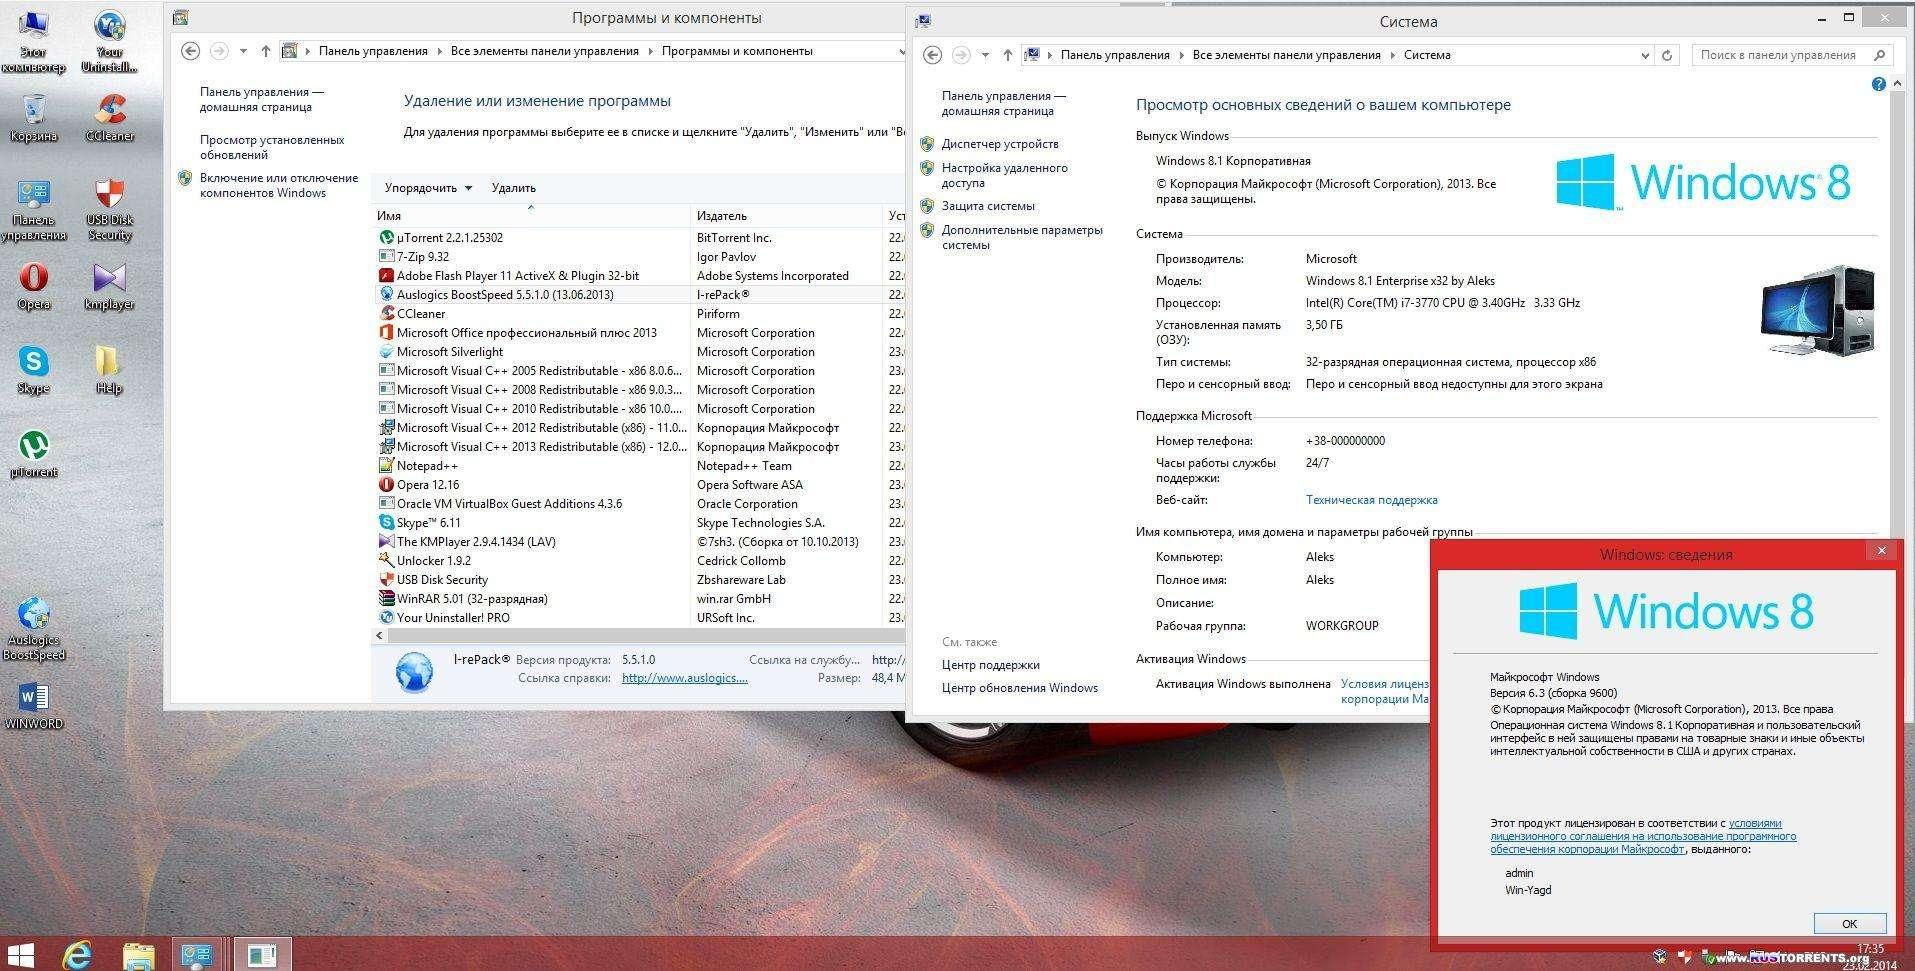 Windows 8.1 Enterprise x86 v.23.02.14 by Aleks RUS